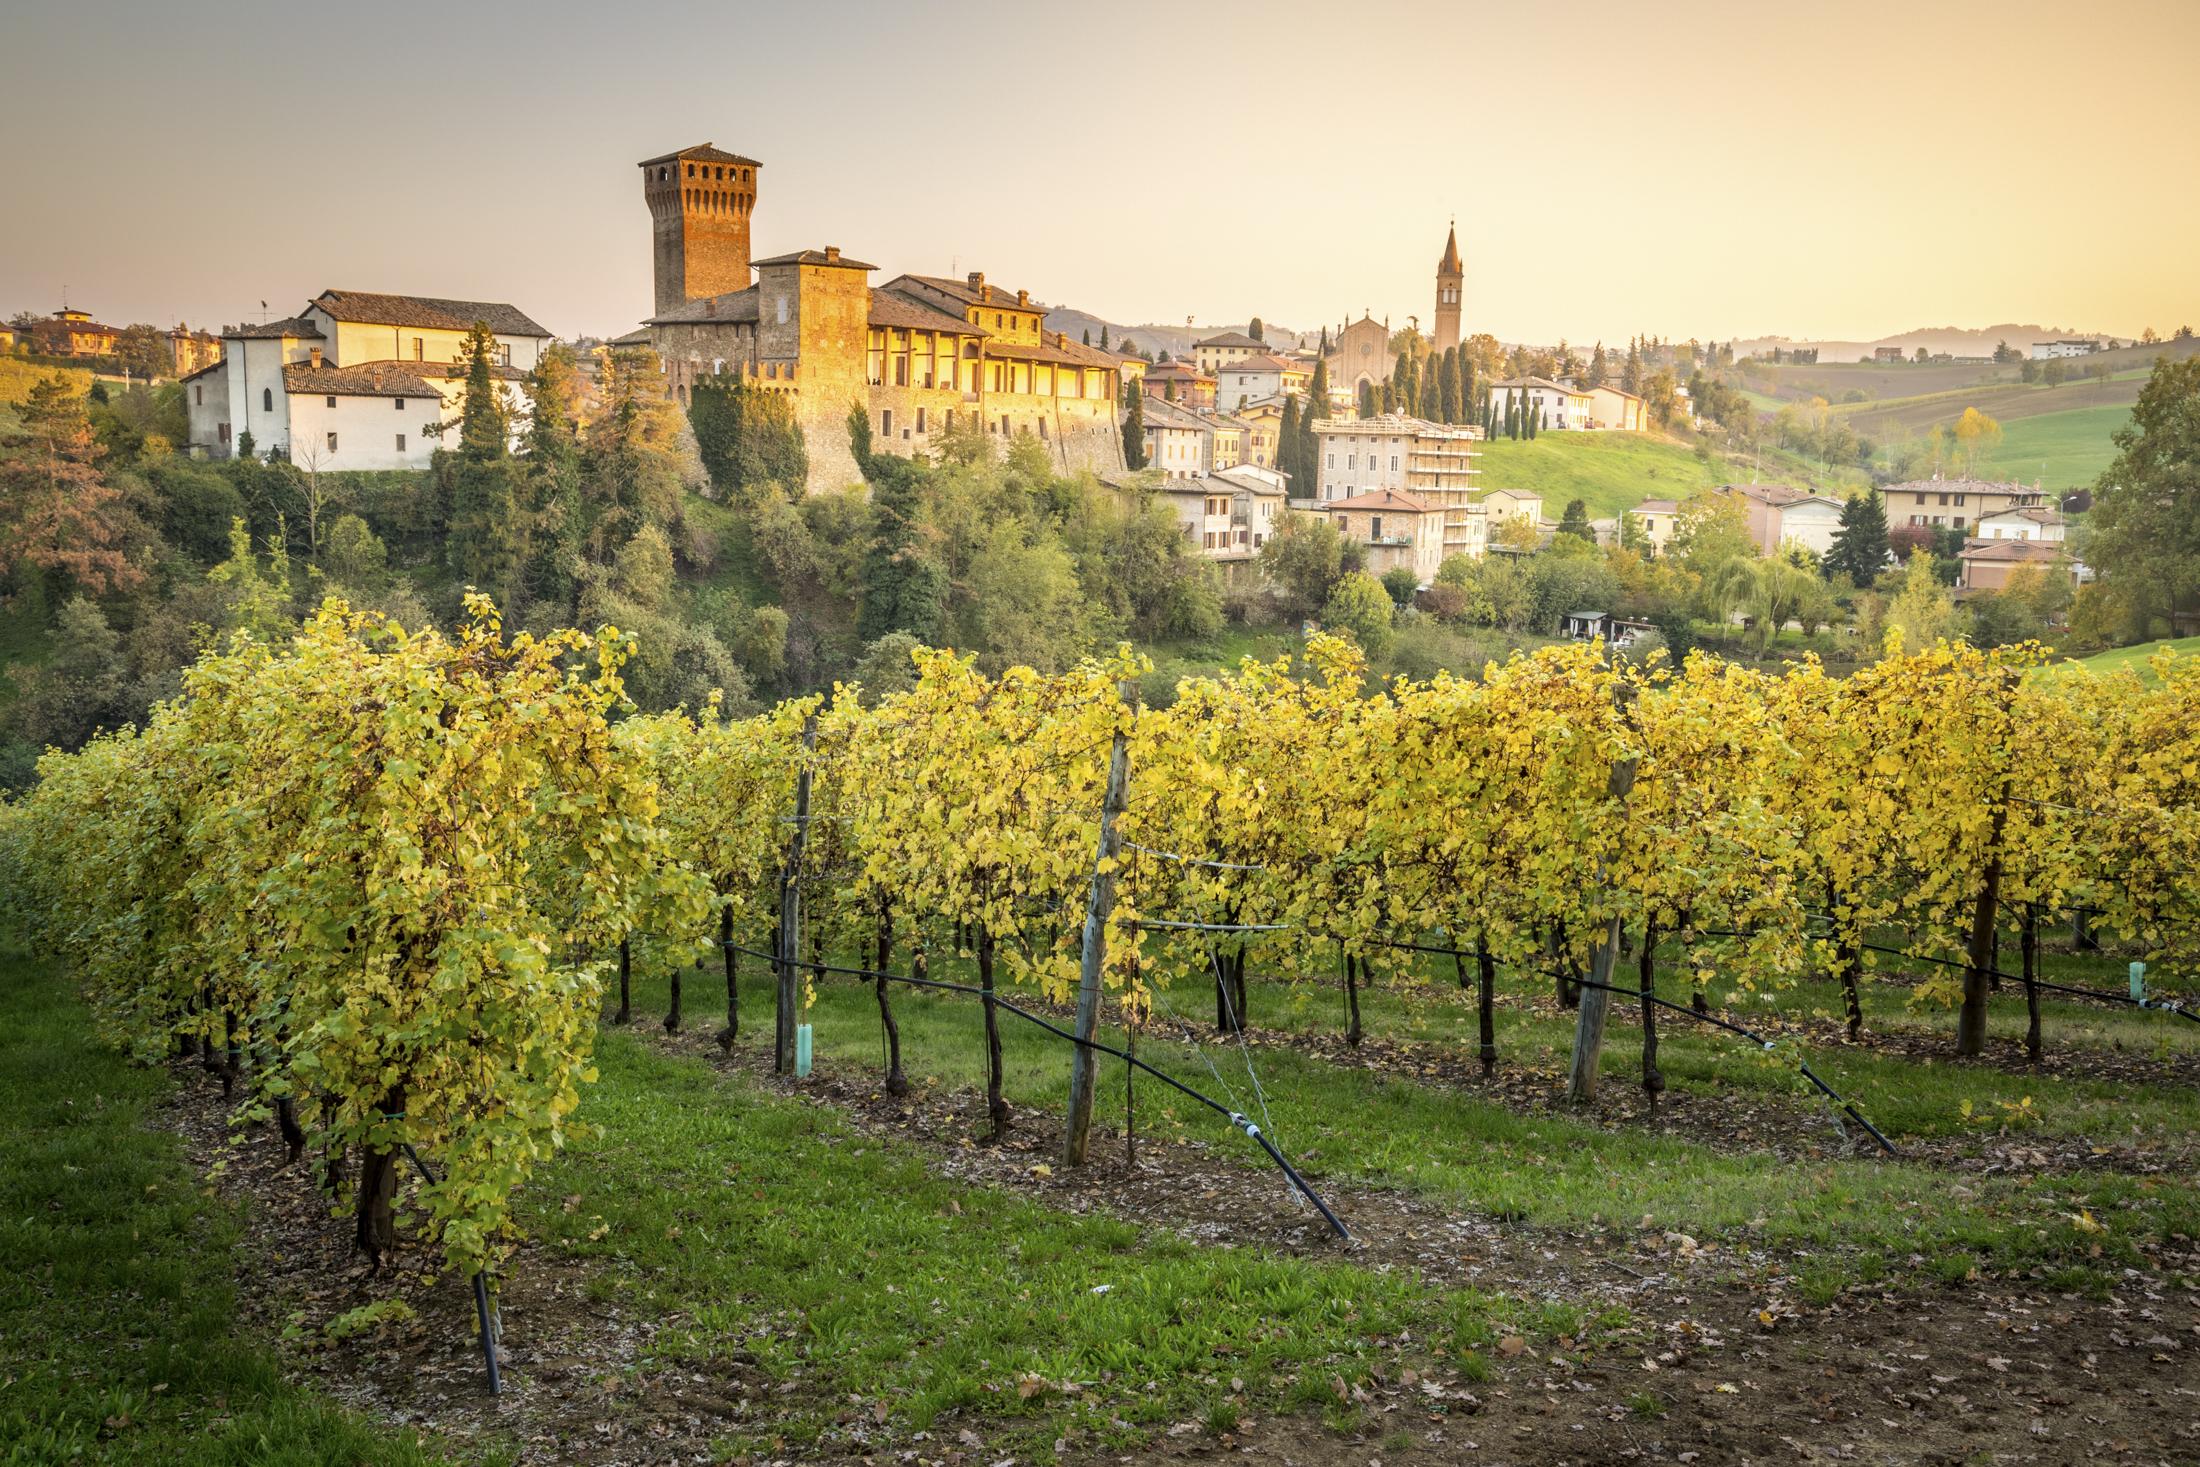 Vineyard in Levizzano Rangone, Modena, Emilia-Romagna.